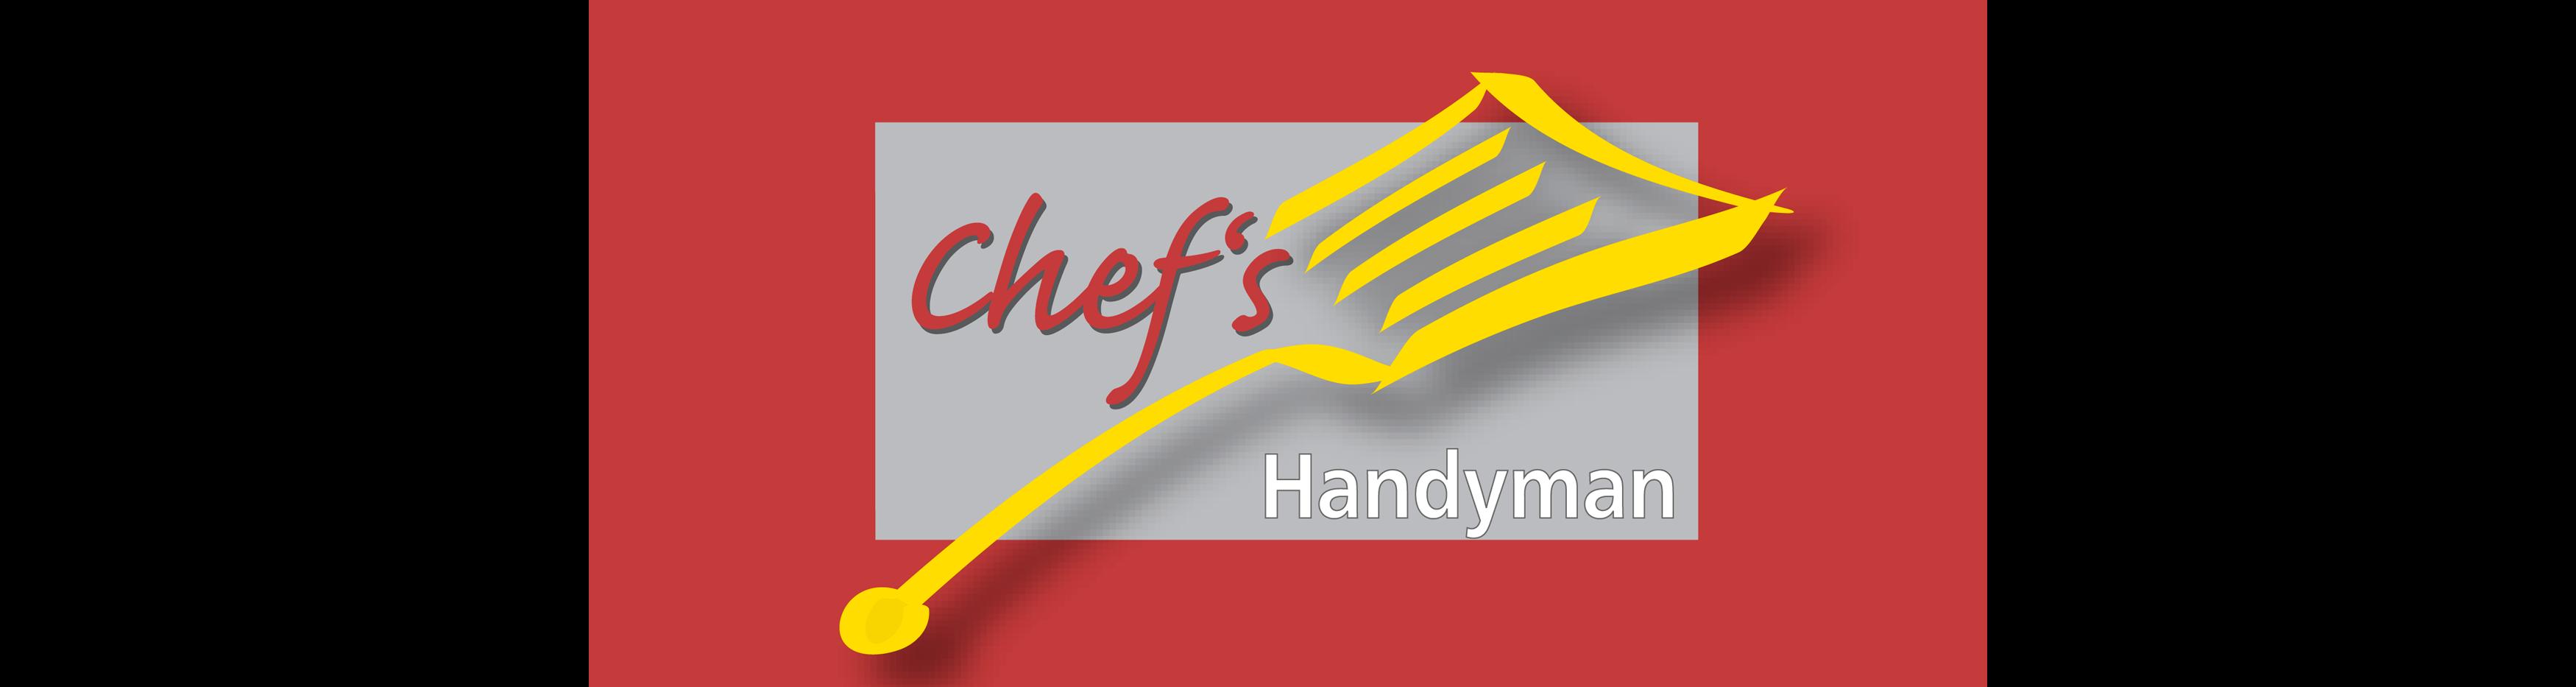 Chef's Handyman English